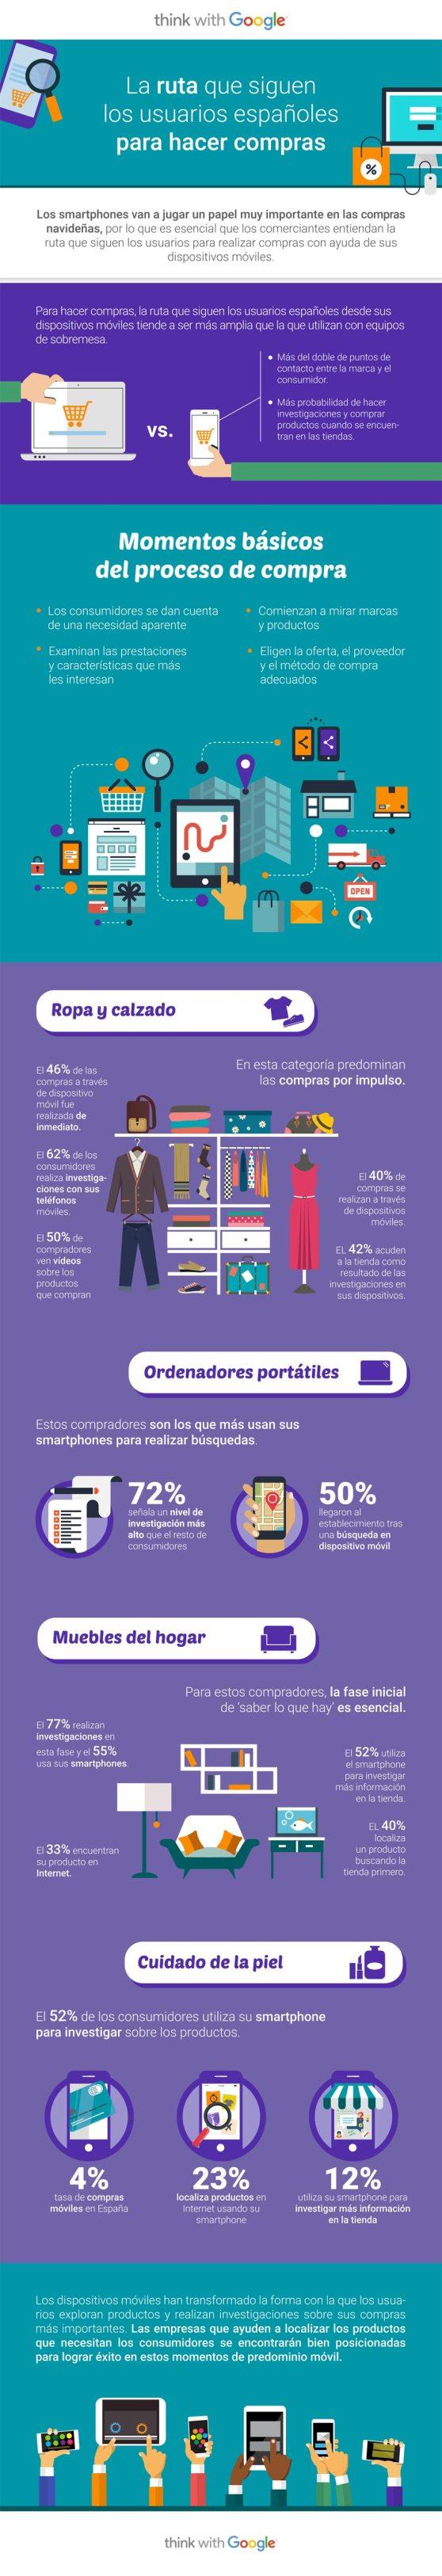 infografia_google_ecommerce